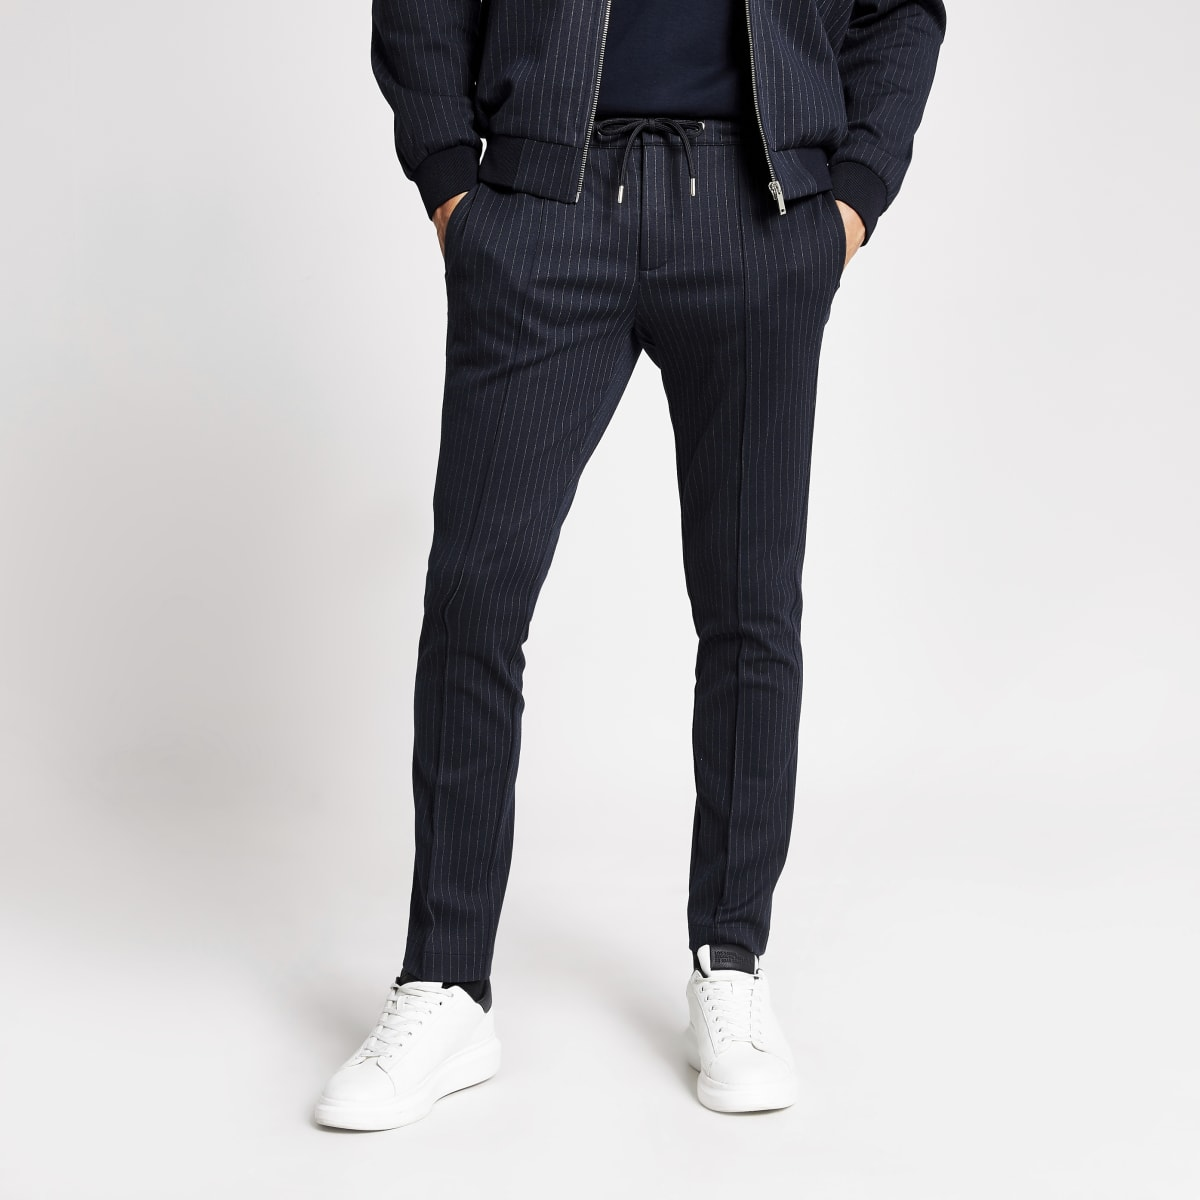 Elegante, marineblaue Skinny Fit Jogginghosen mit Streifen